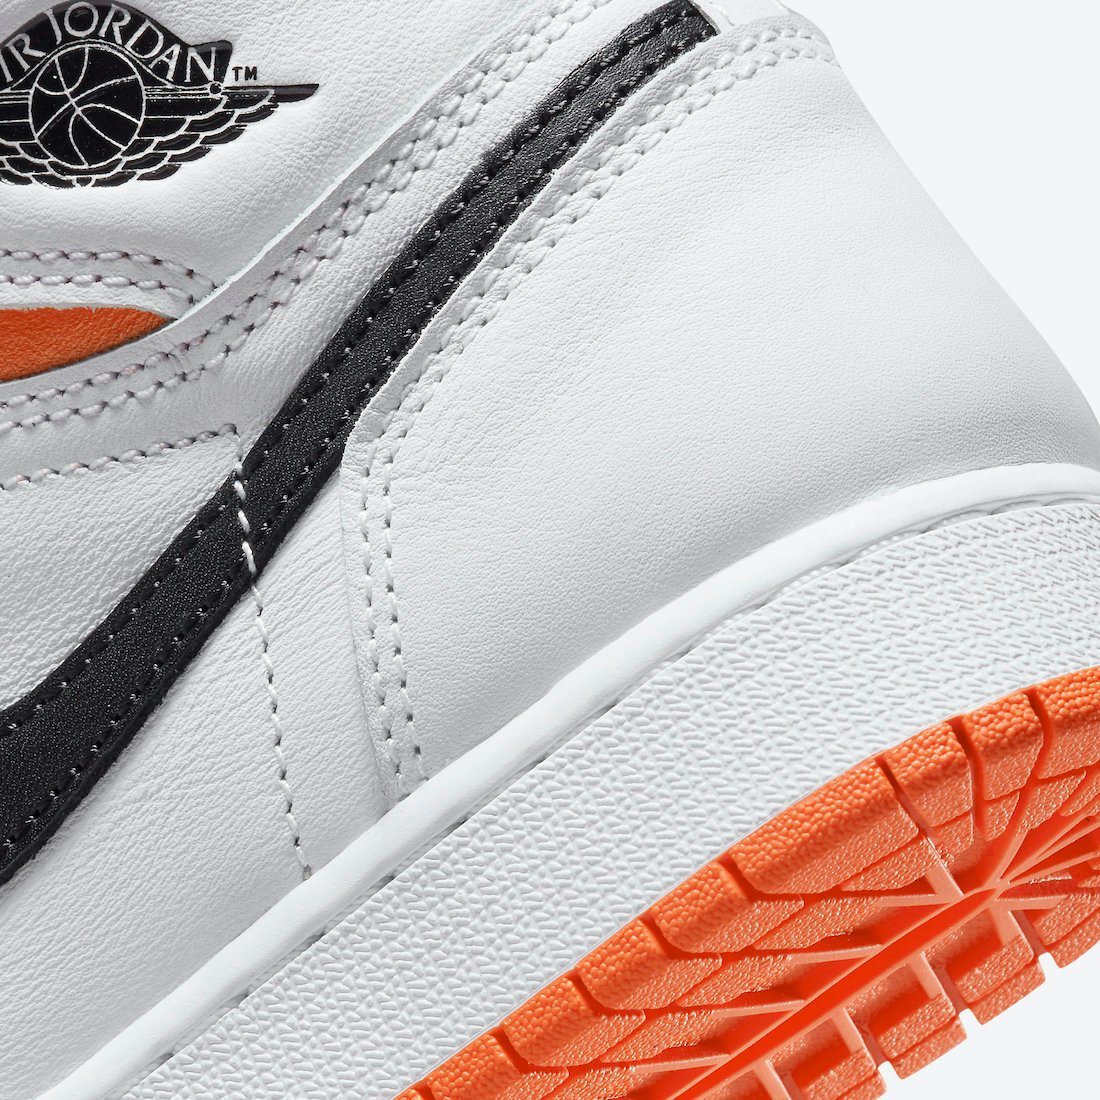 Air Jordan 1 Electro Orange GS 575441-180